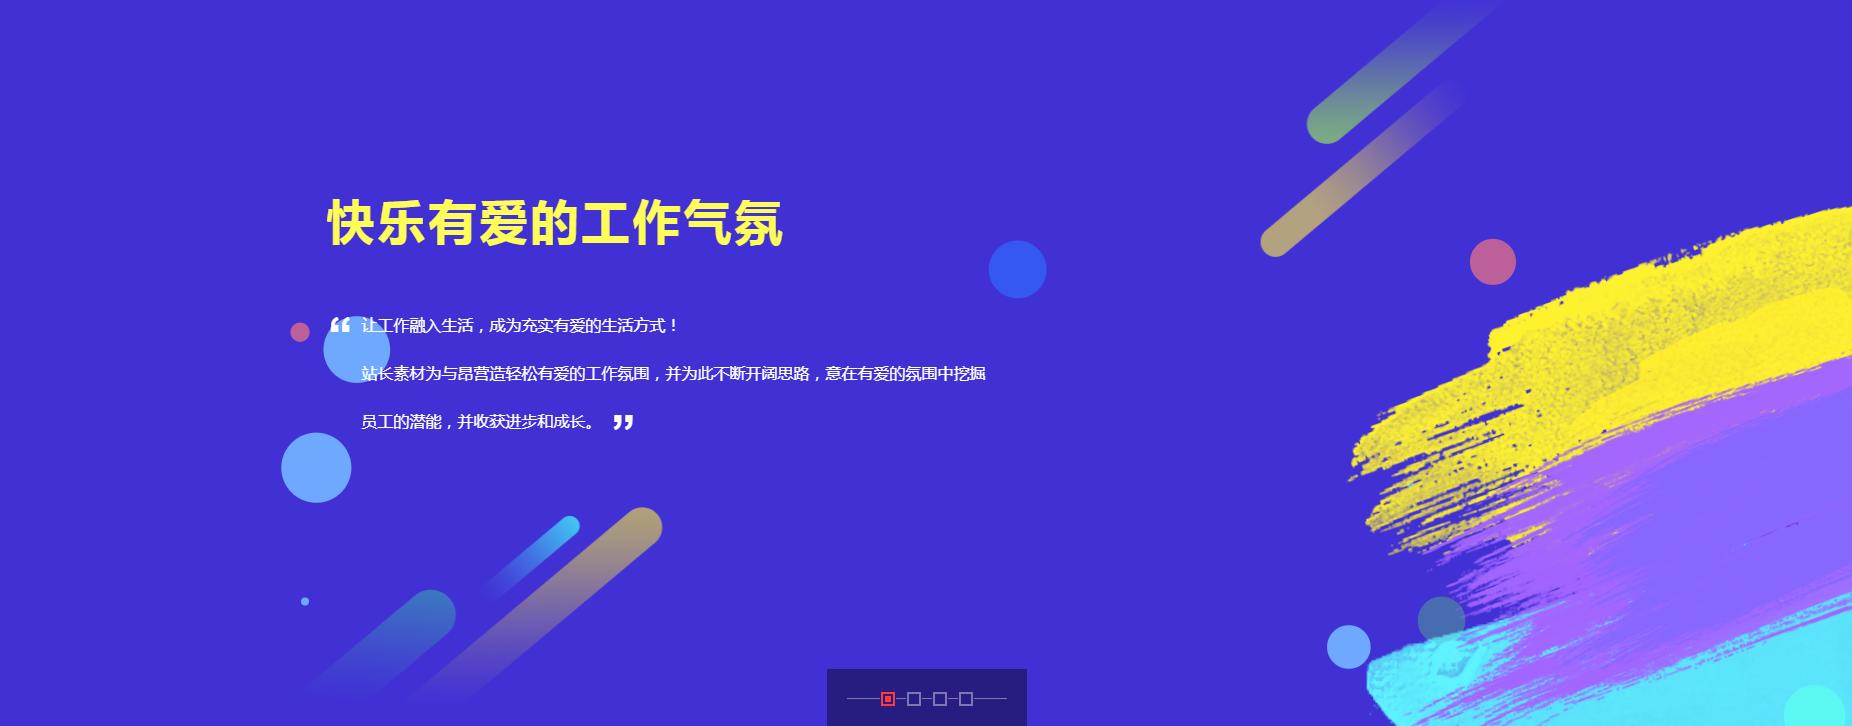 CSS3全屏动画特效幻灯片图片切换代码